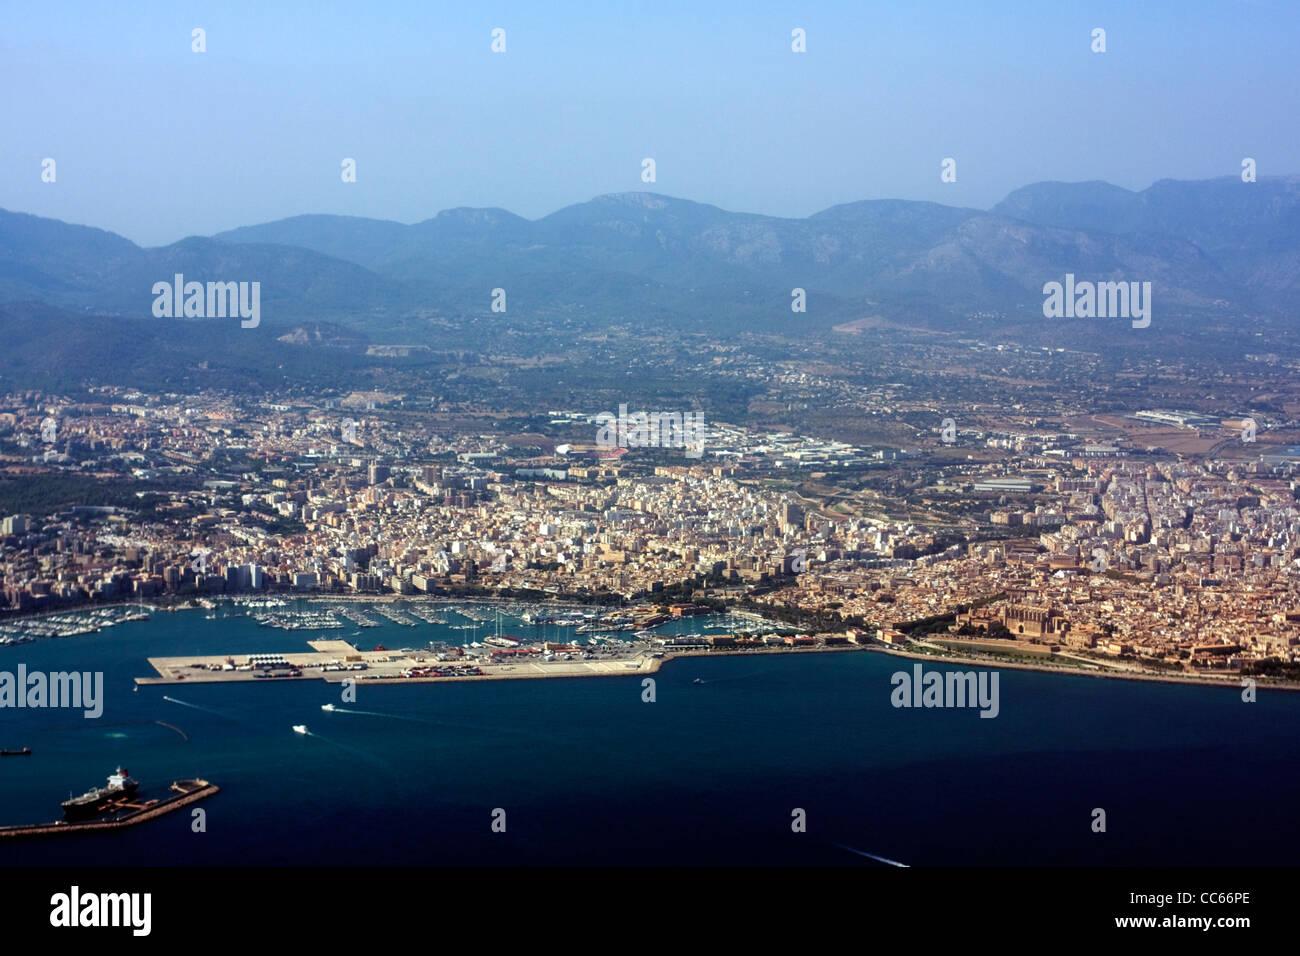 Aerial view of Palma, Majorca, Spain Stock Photo